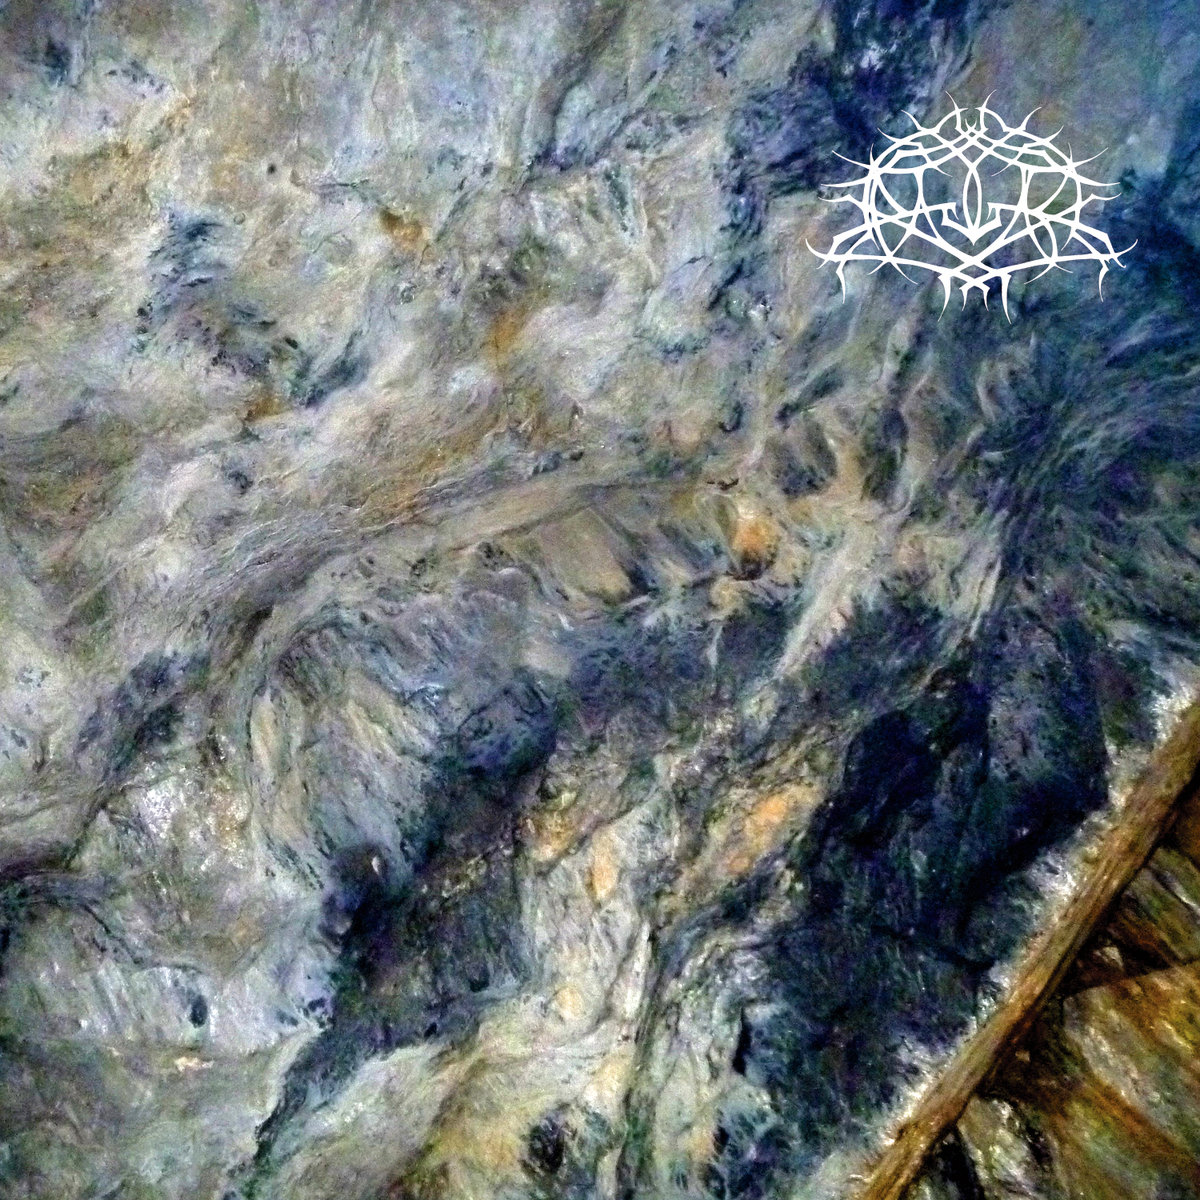 Krallice new EP Hyperion